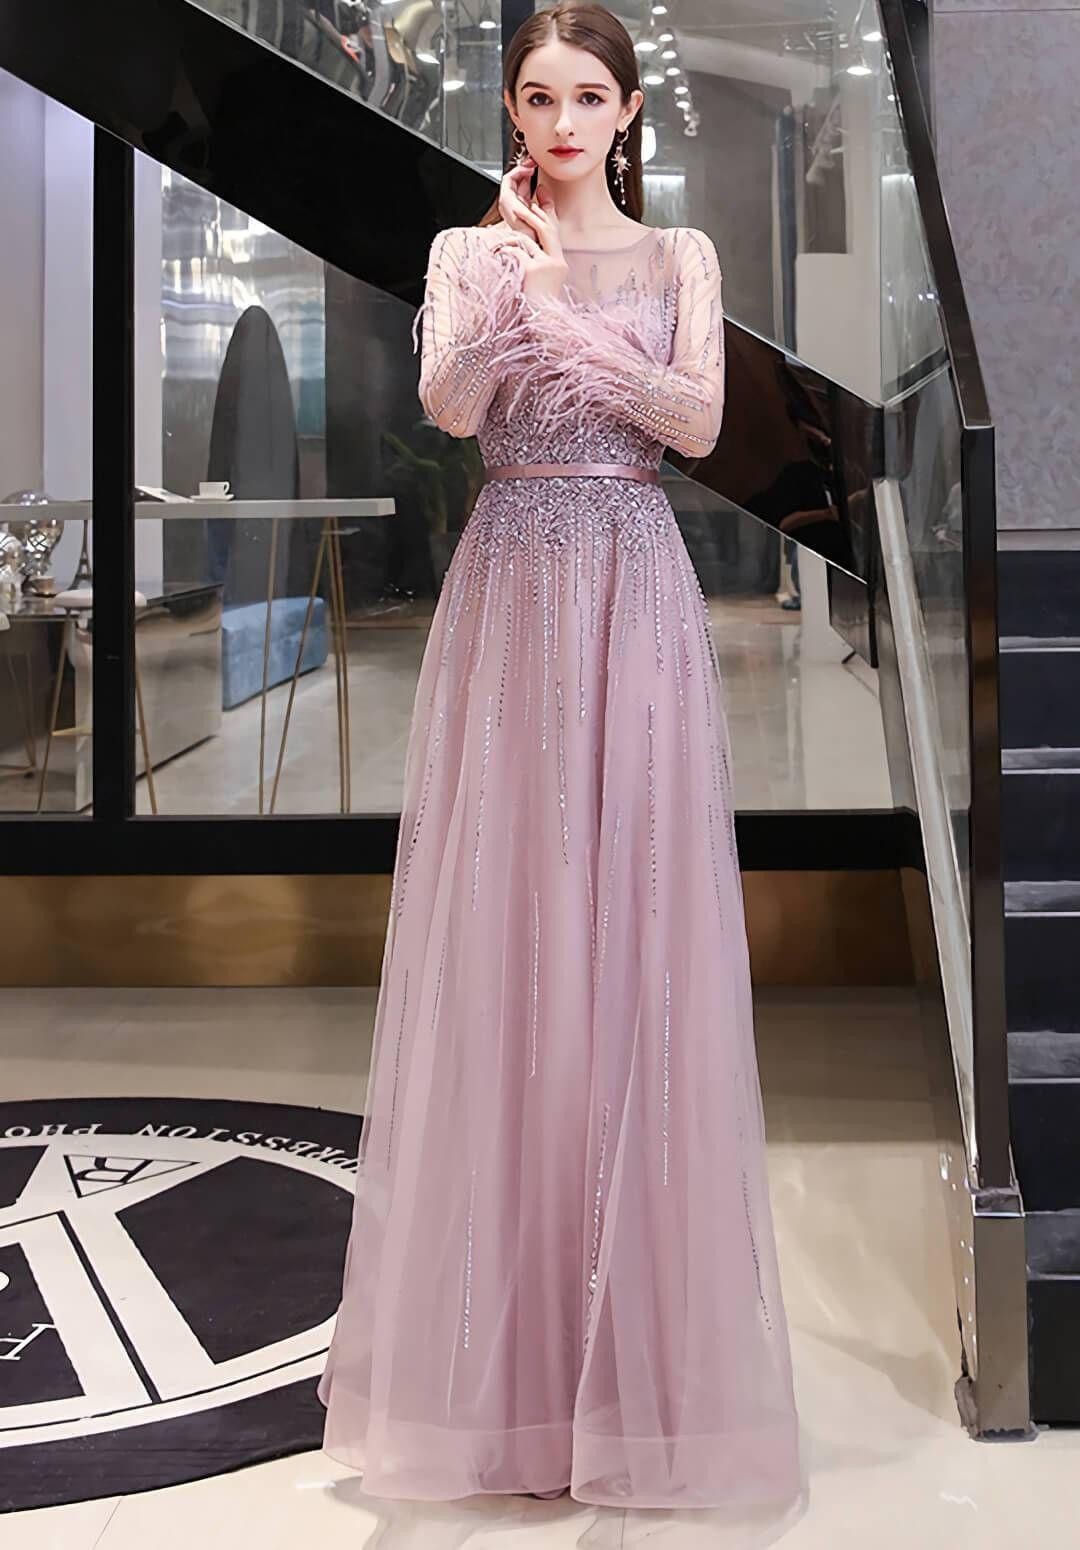 ALine Prom Dresses Junoesque Rhinestones Embellished